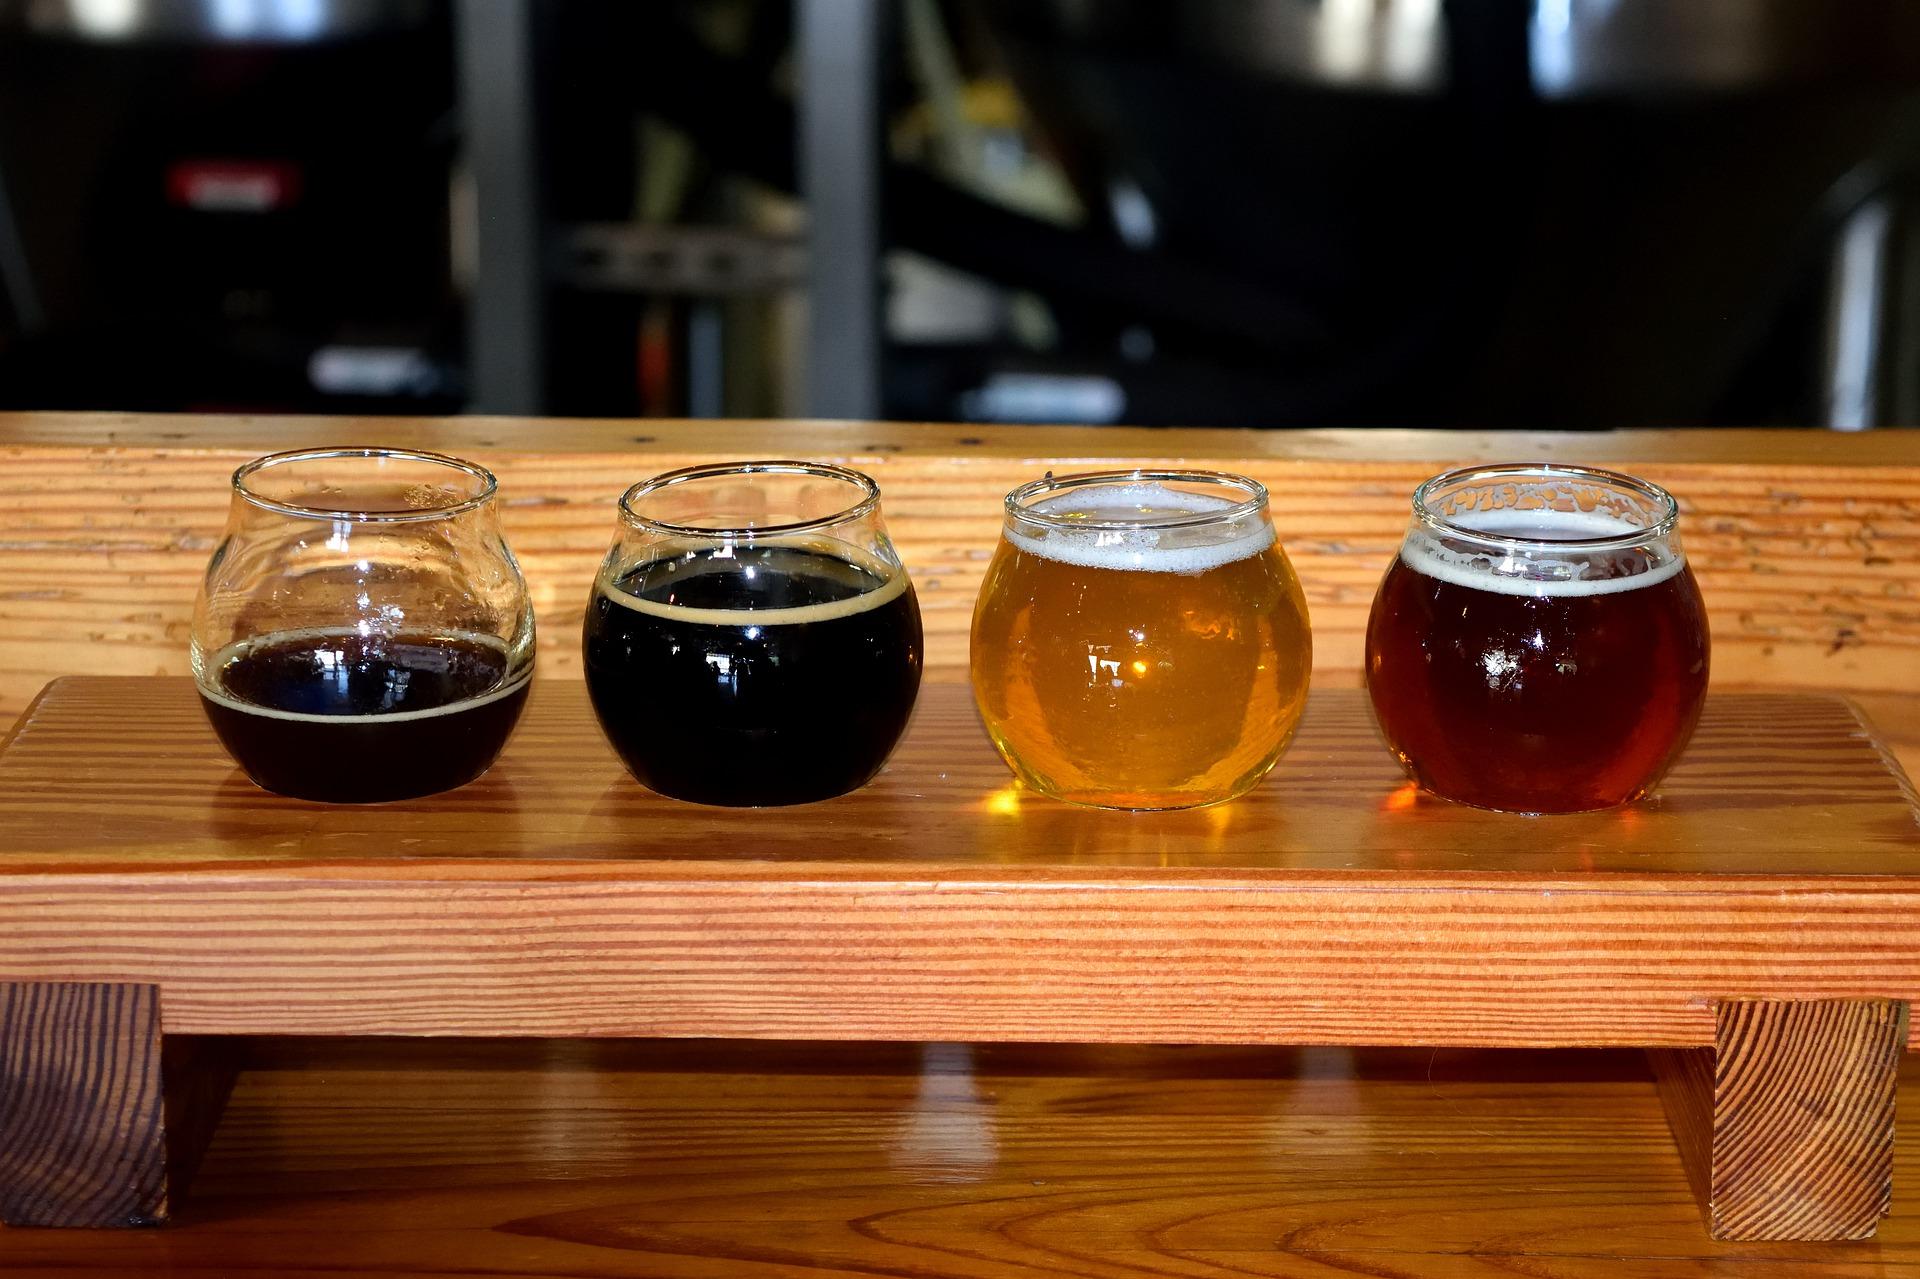 https://buffalocal.com/wp-content/uploads/2020/01/beer-tasting-flight-4599048_1920.jpg